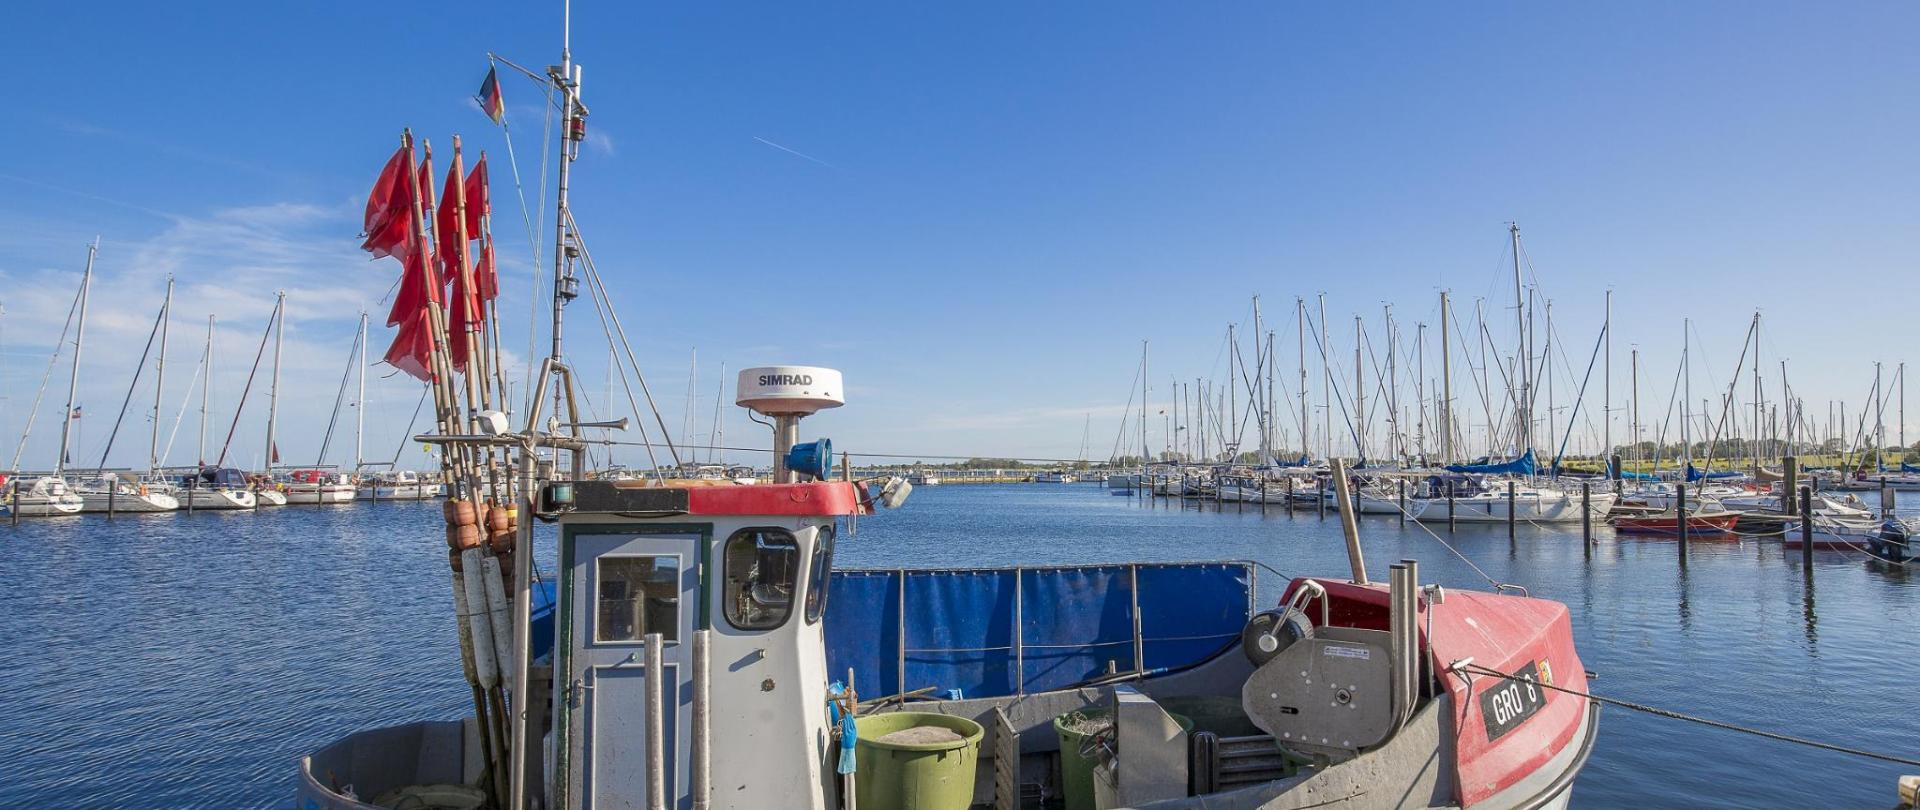 GroBro Hafen4.jpg